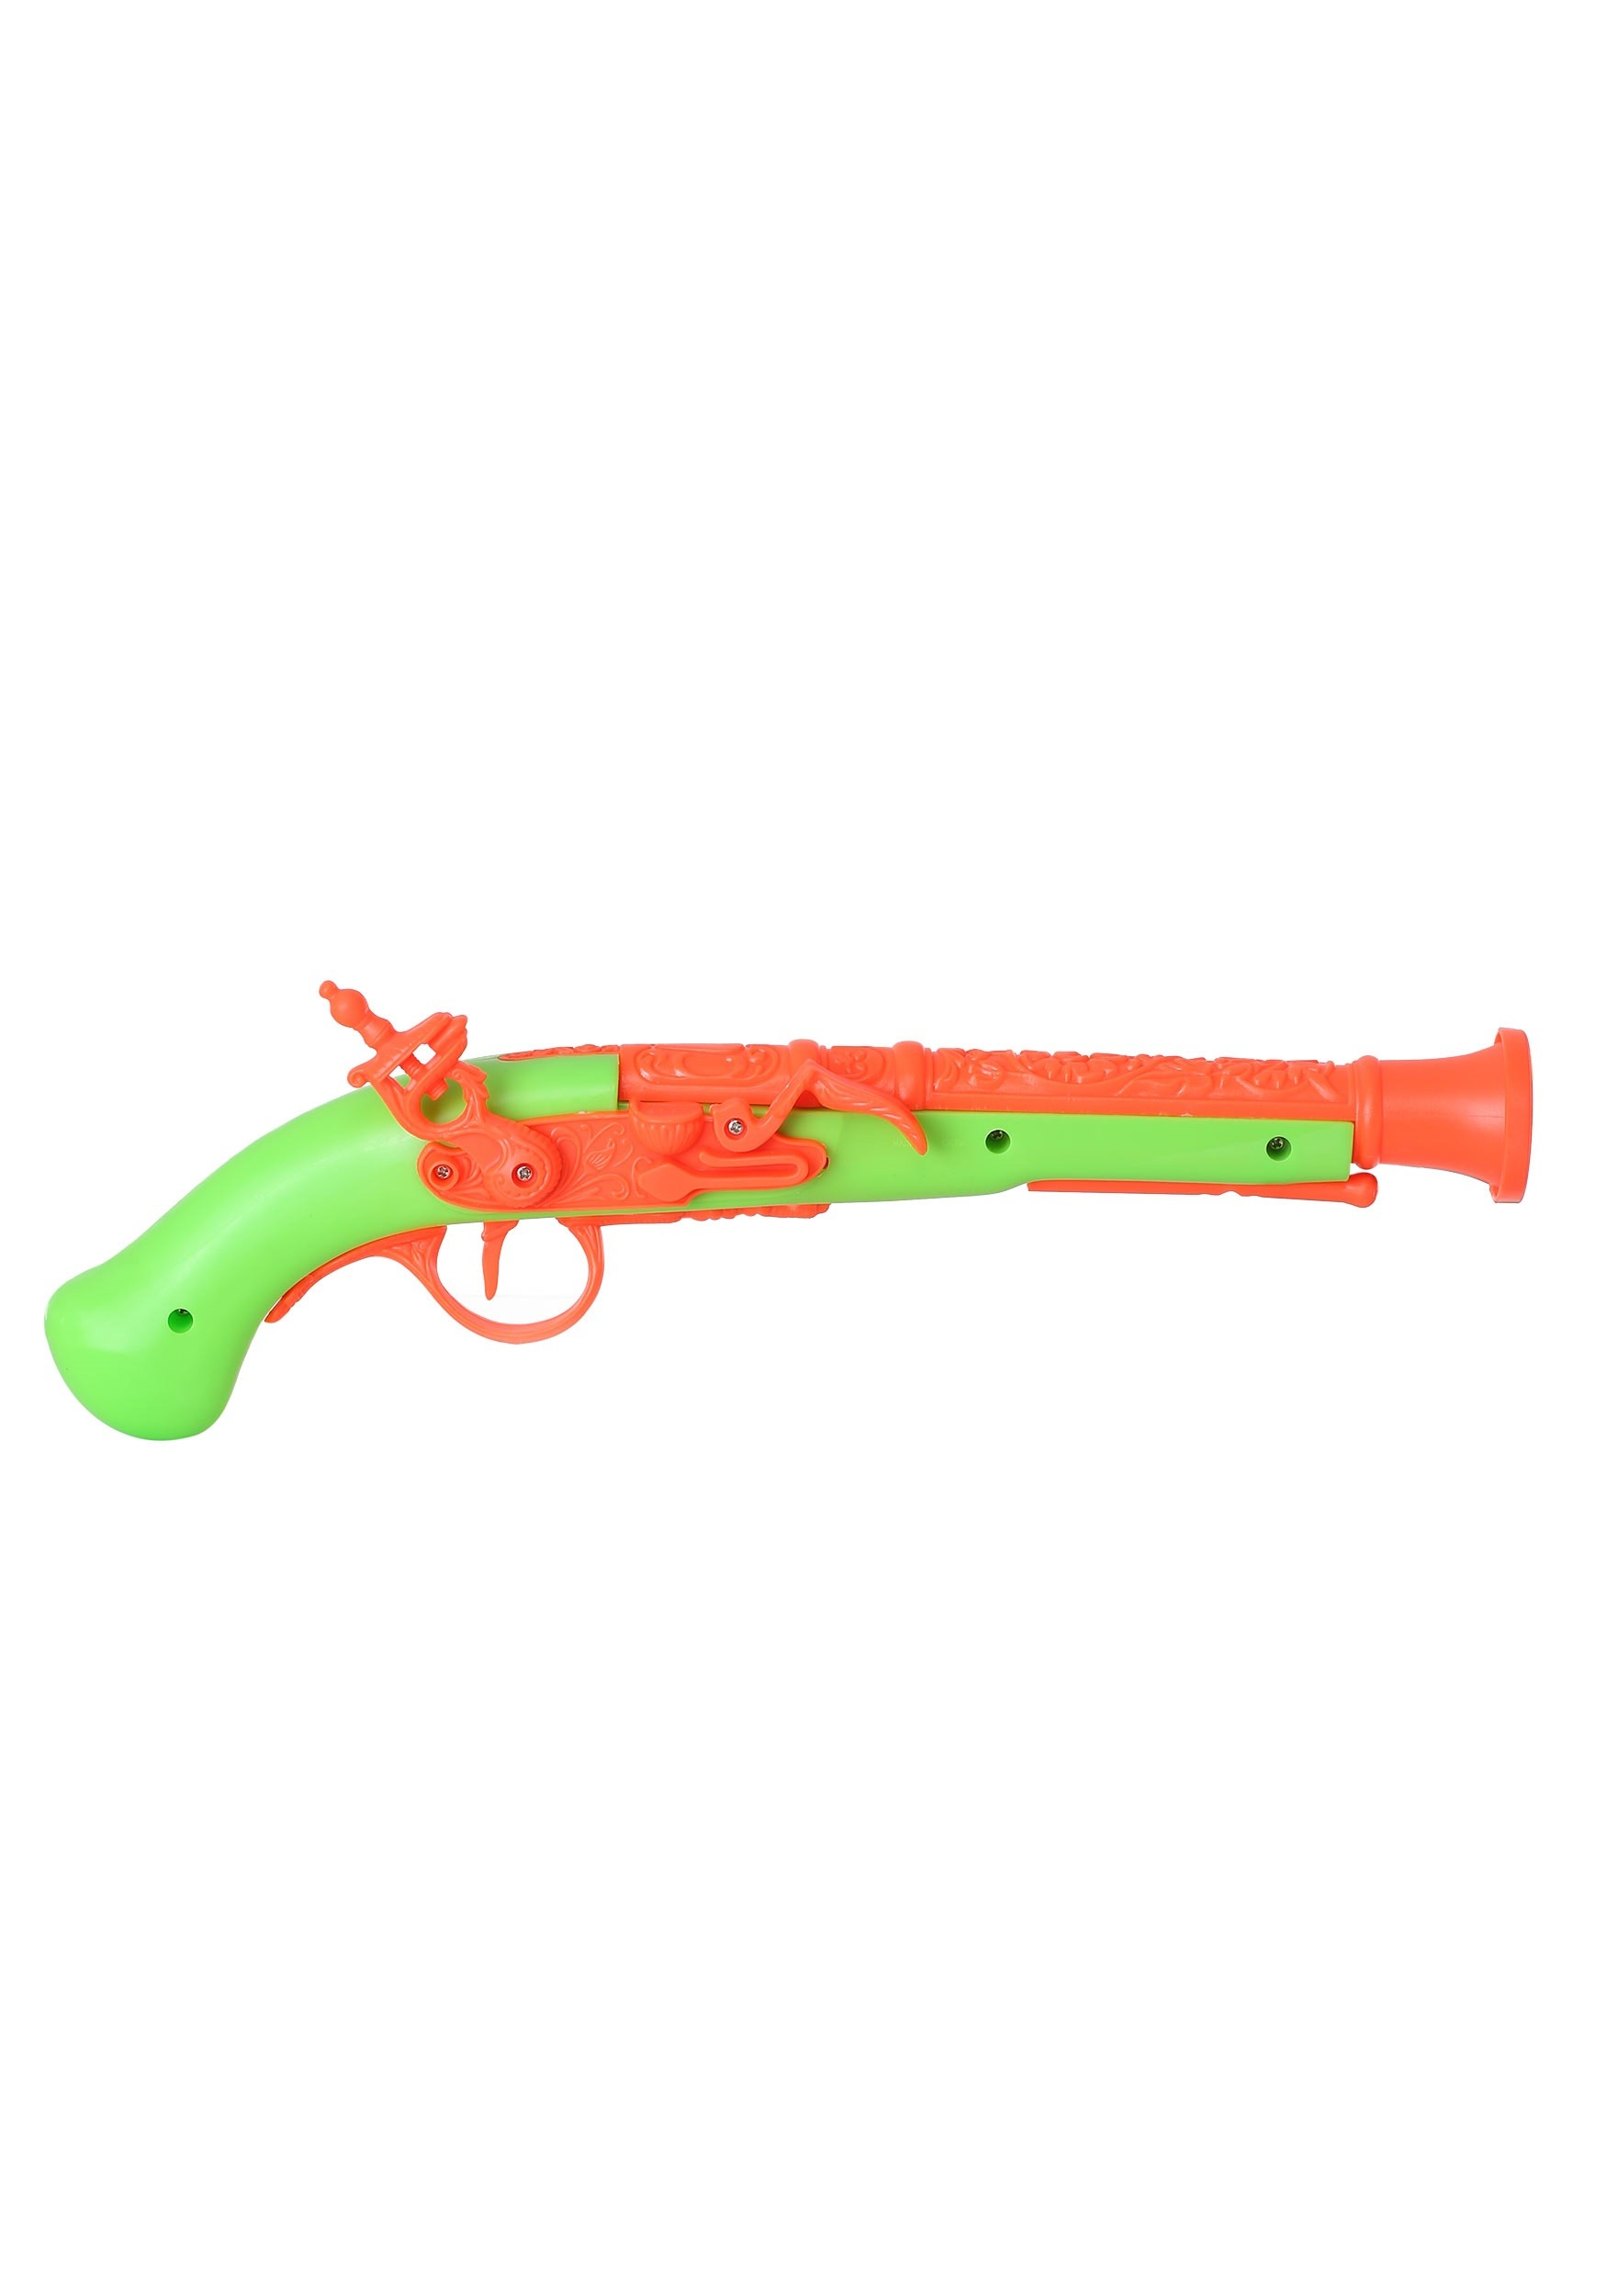 Orange/Green Flintlock Pirate Pistol